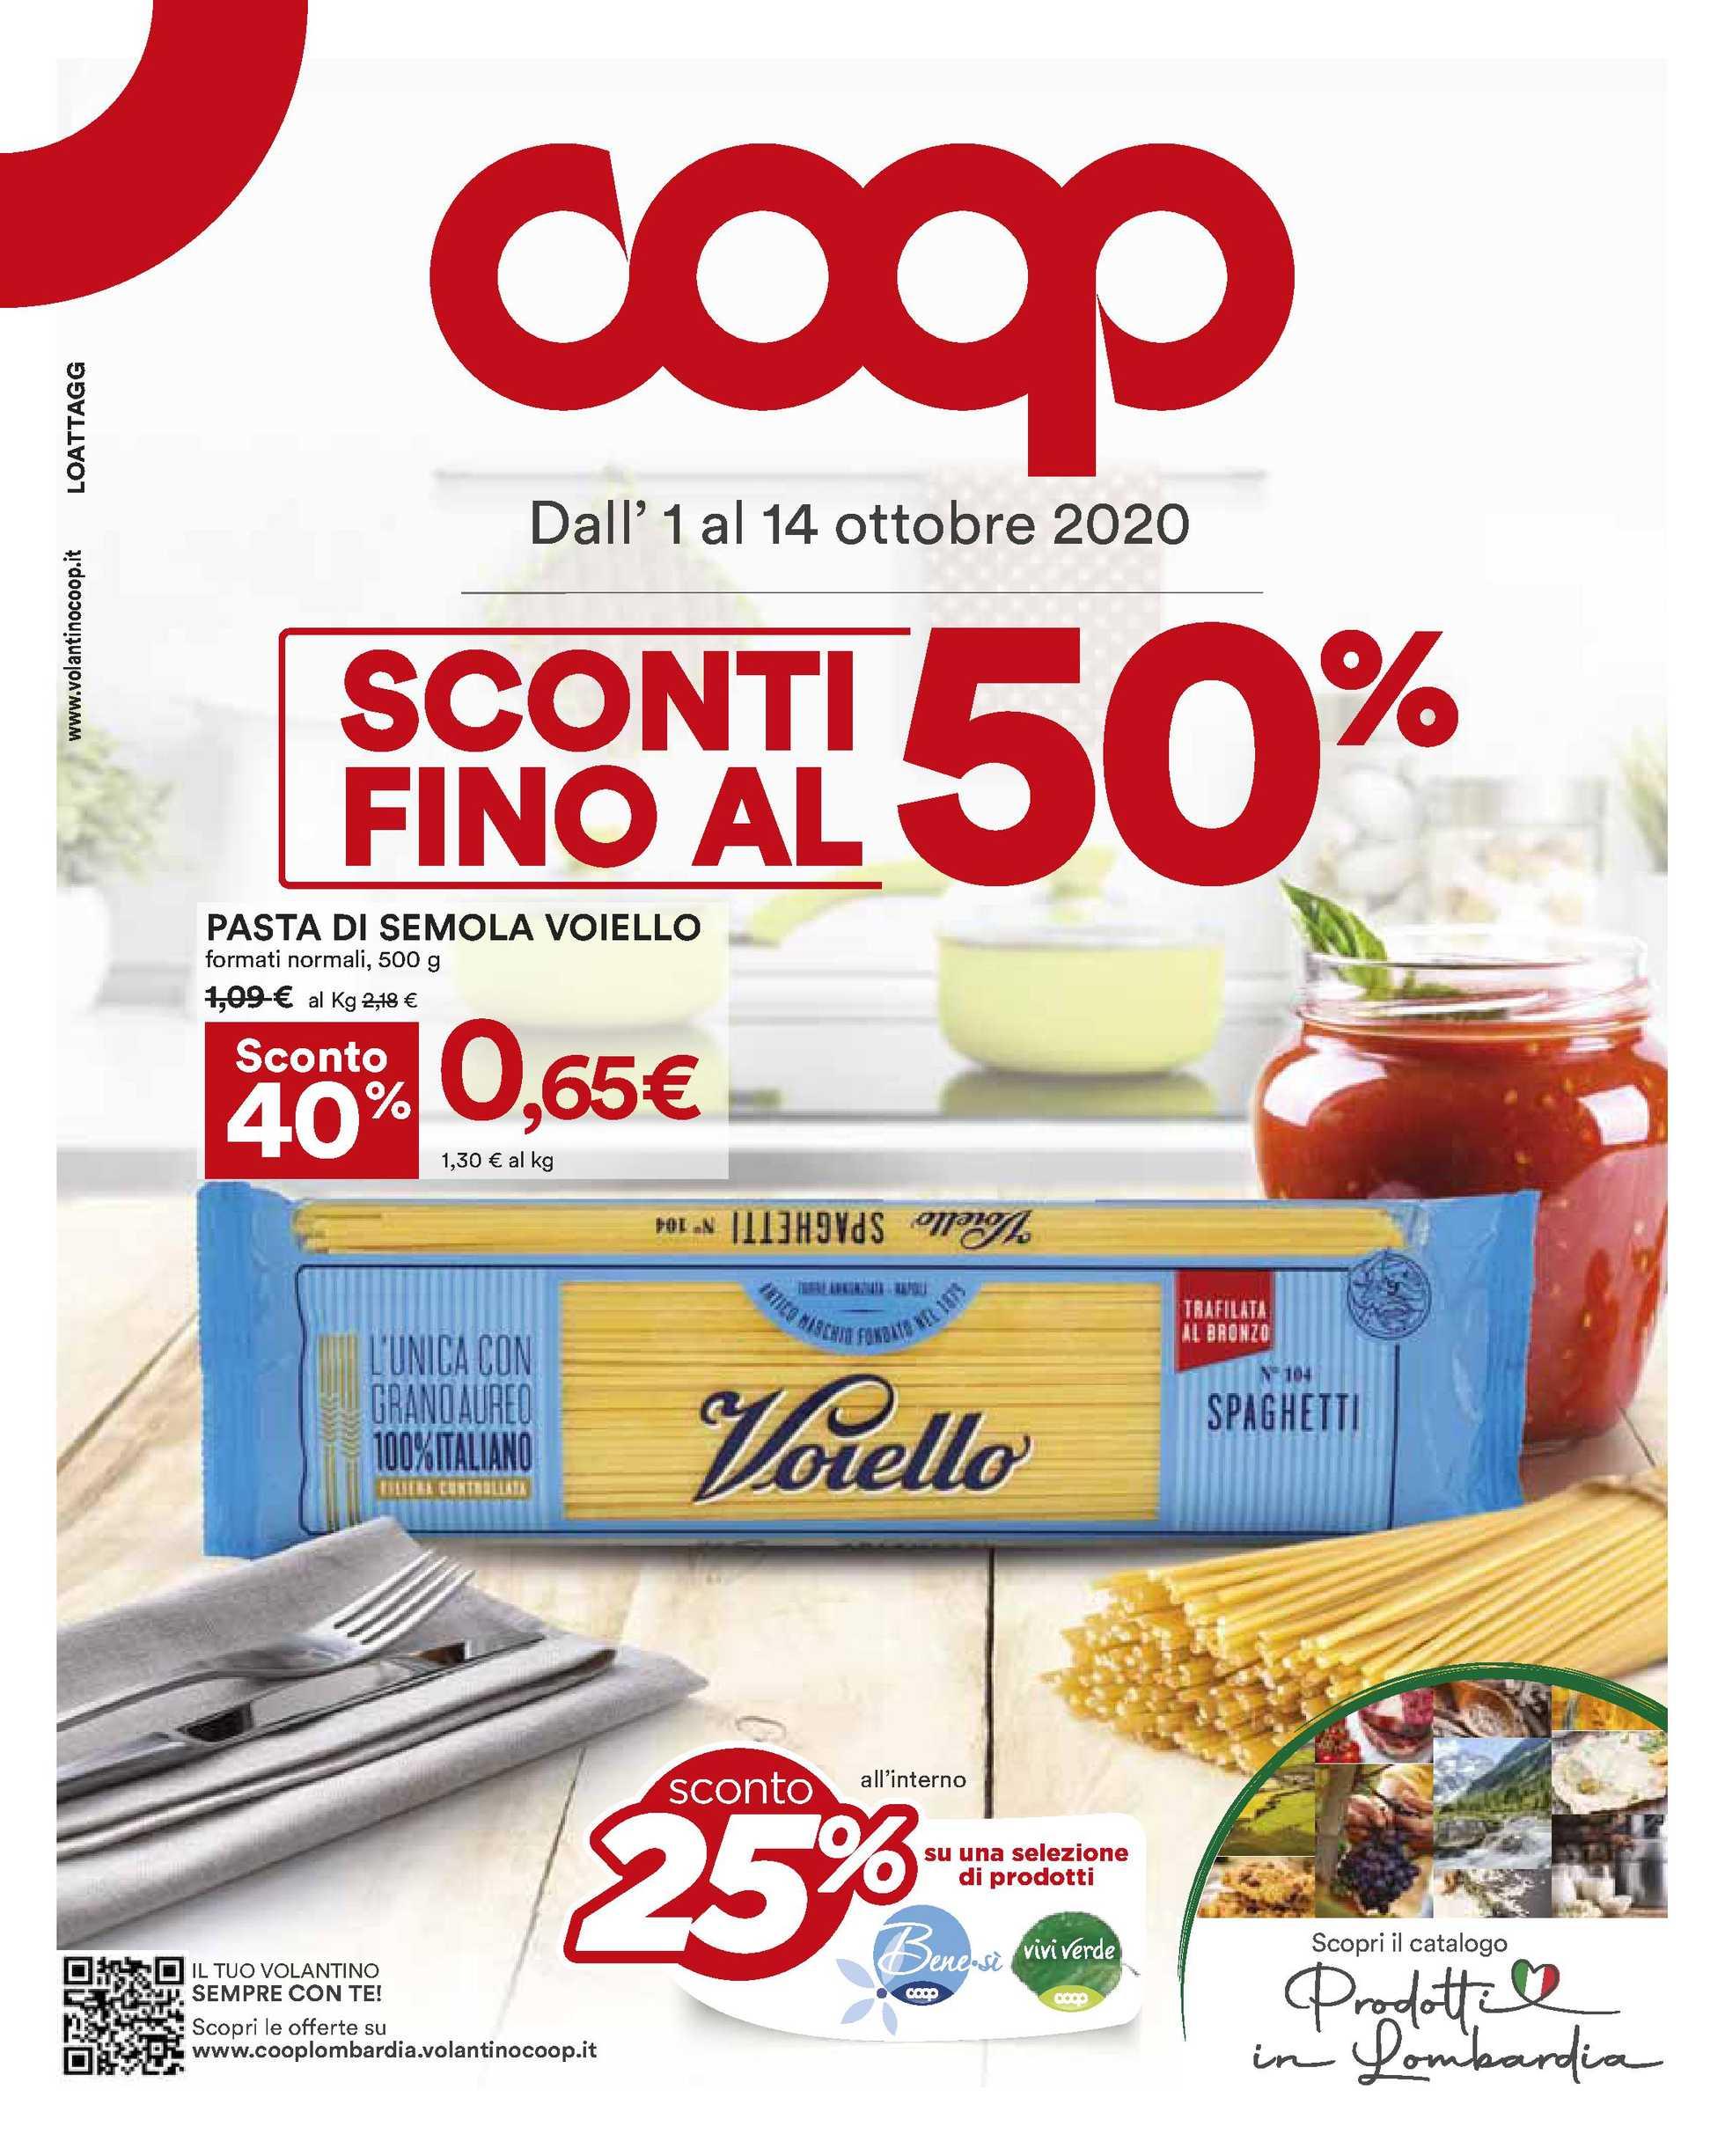 Coop Alleanza 3.0 - offerte valide dal 01.10.2020 al 14.10.2020 - pagina 1.